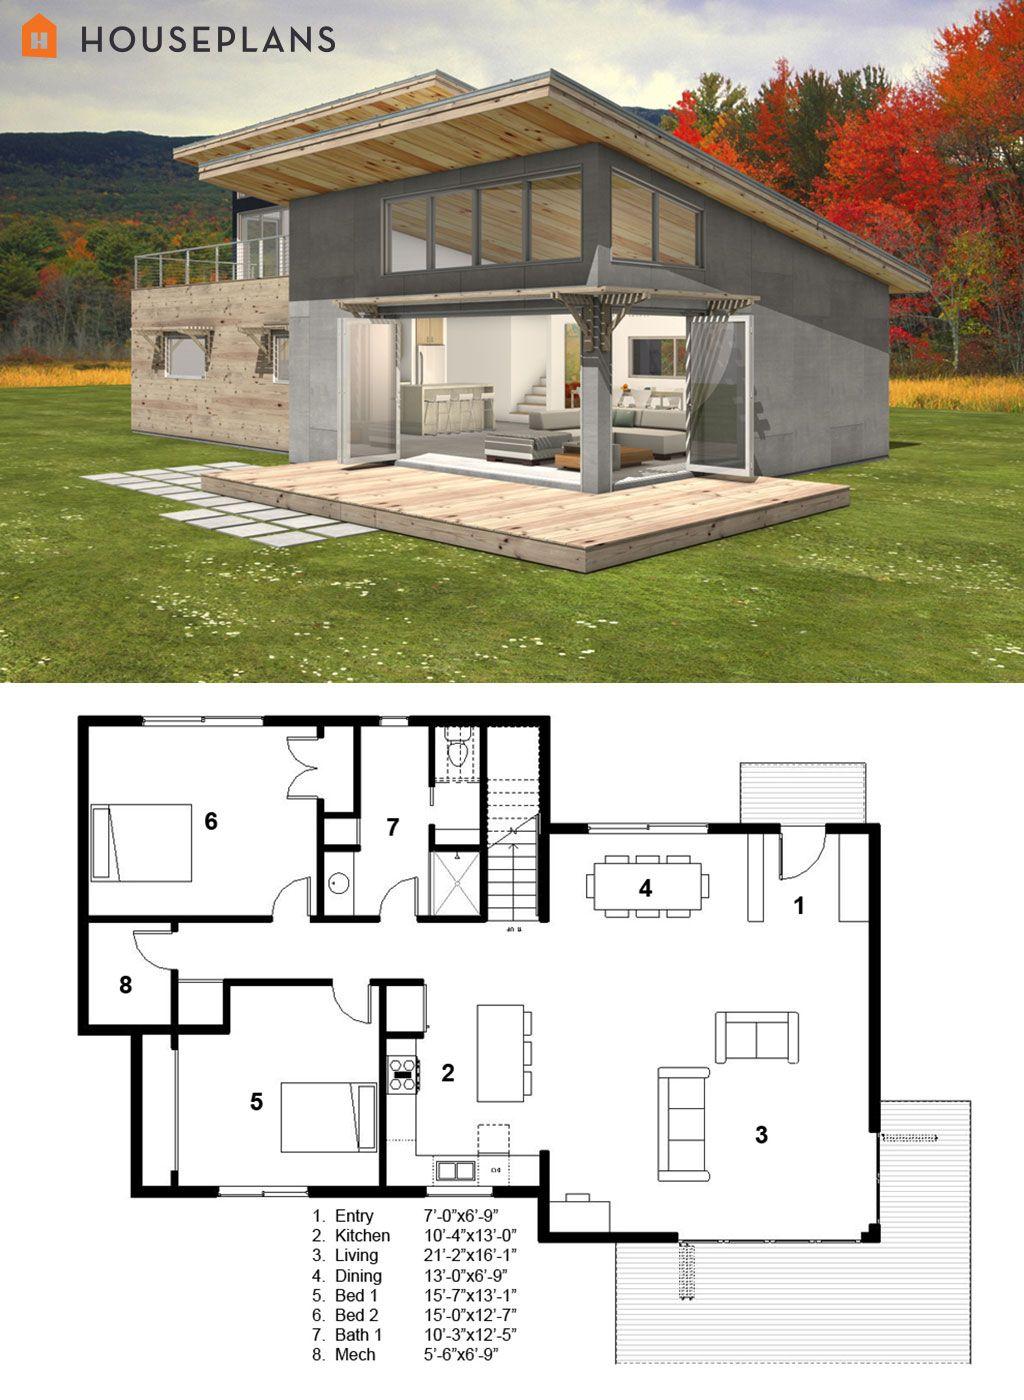 Modern Style House Plan 3 Beds 2 Baths 2115 Sq Ft Plan 497 31